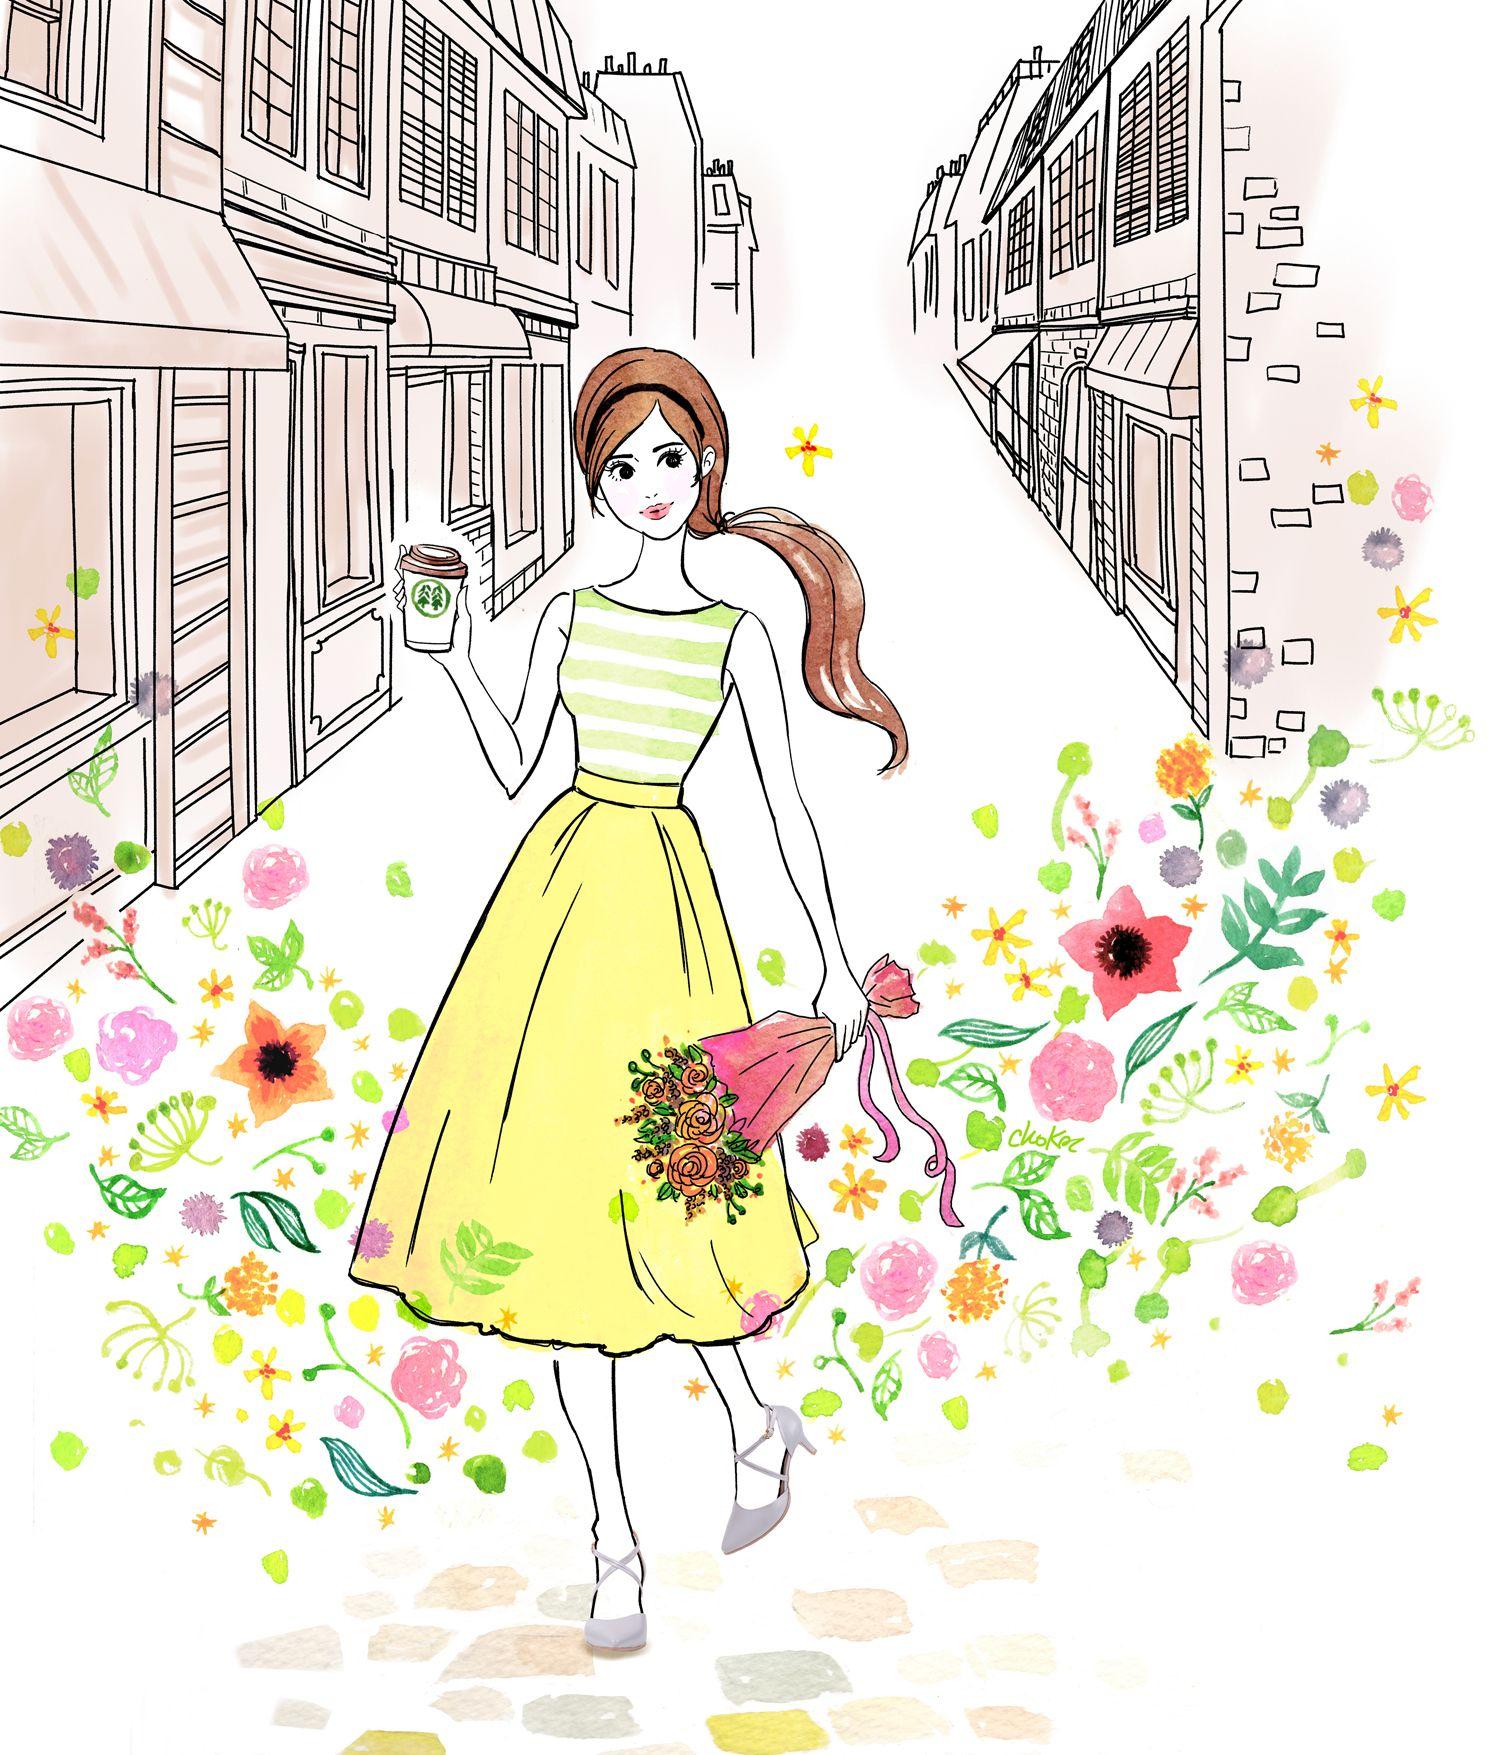 illustration choko #warm #illustration #paris #yellow #bicycle #spring #flower